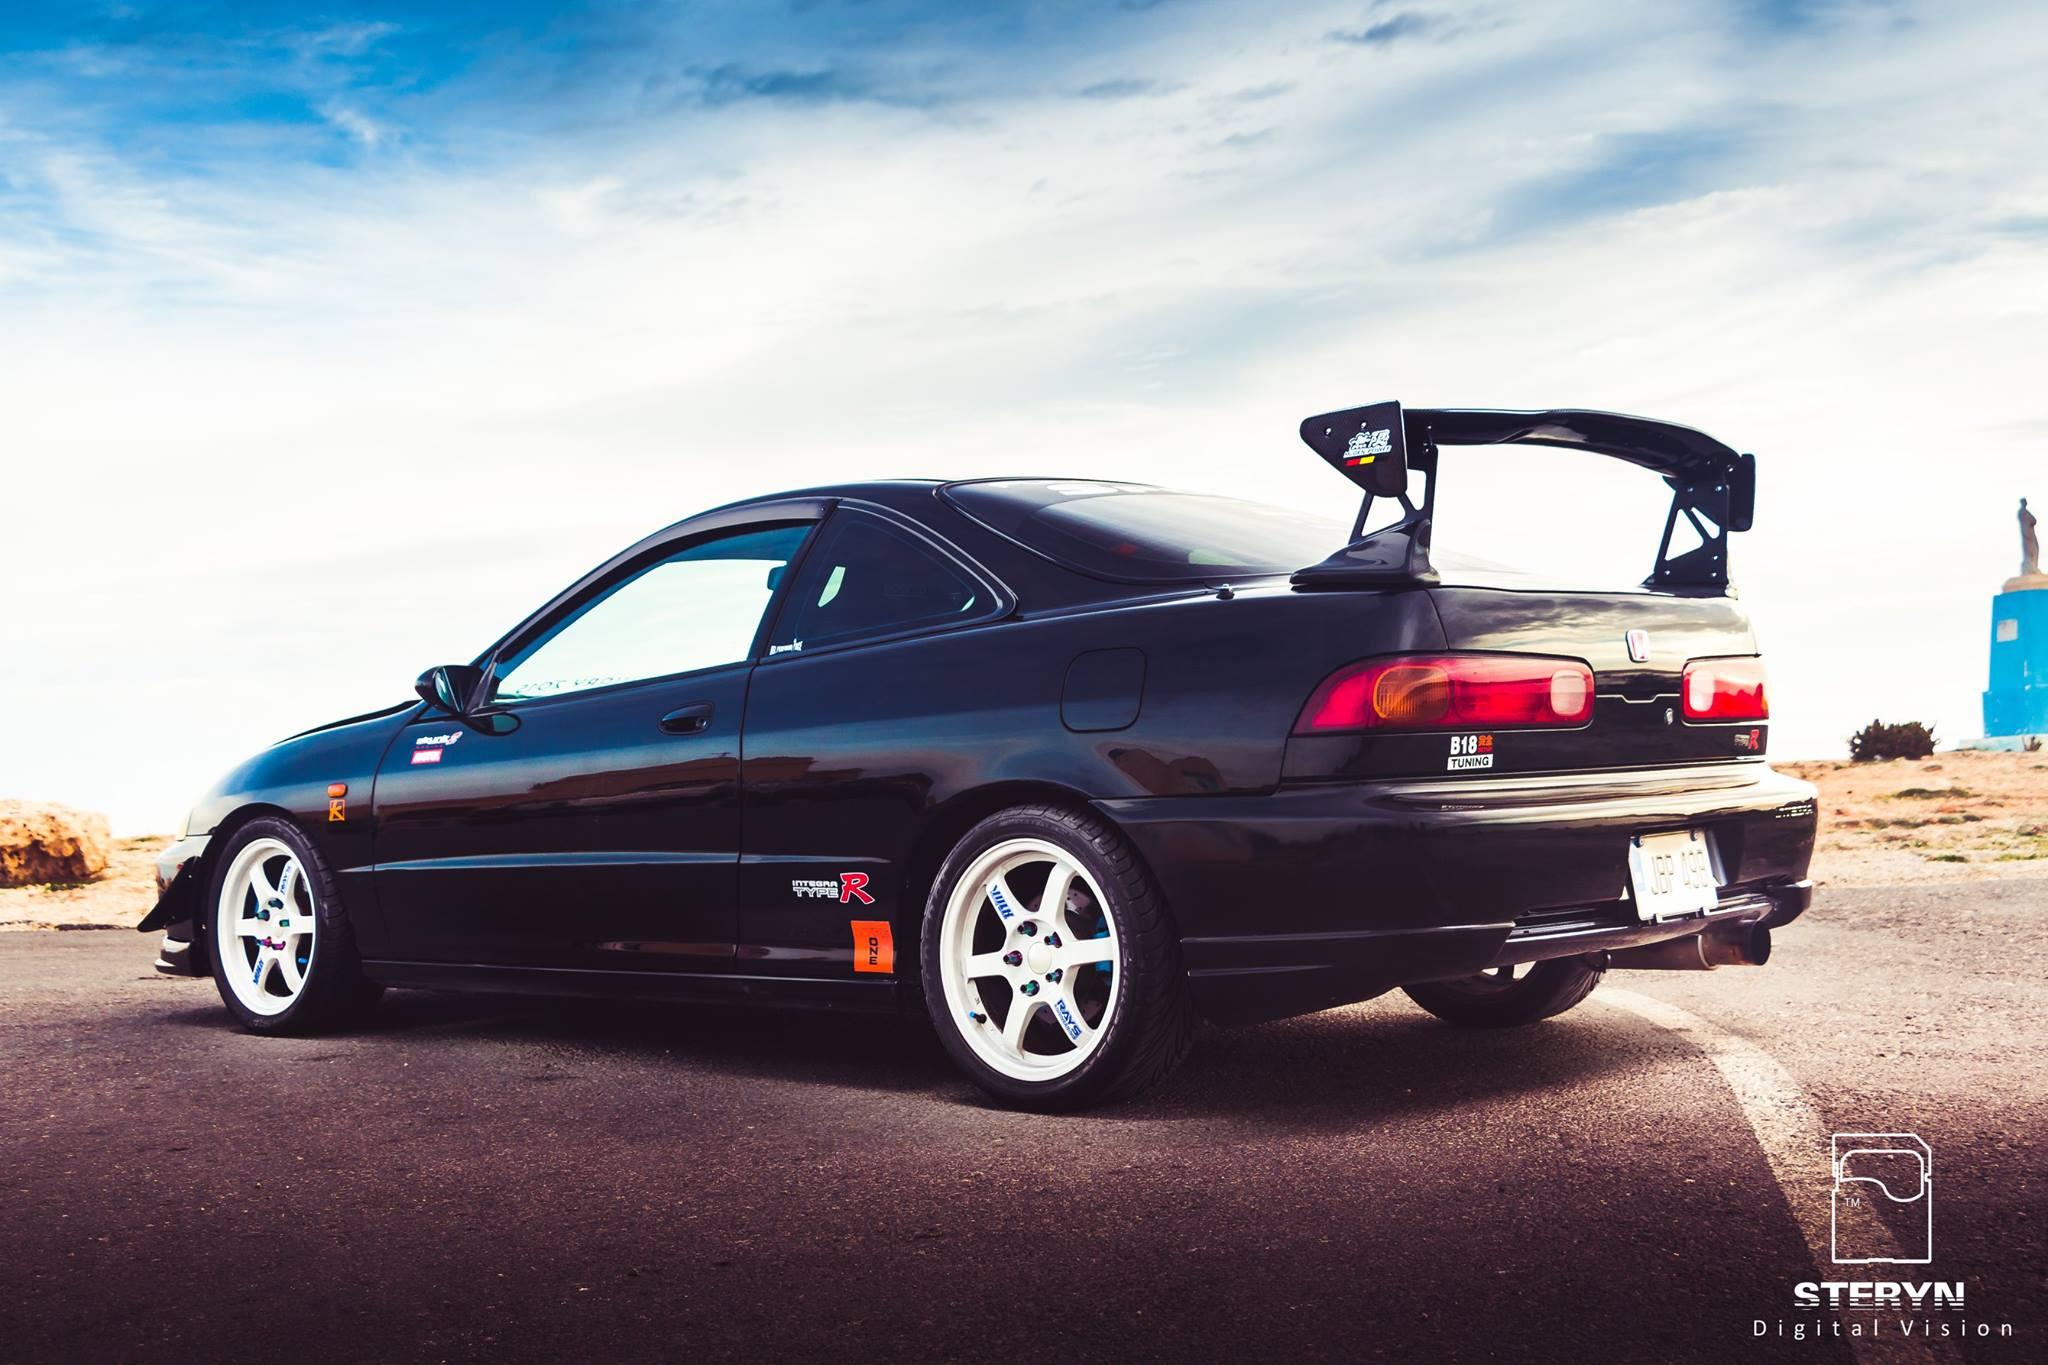 Starlight Black Pearl 1998 JDM Honda Integra Type-r passenger side